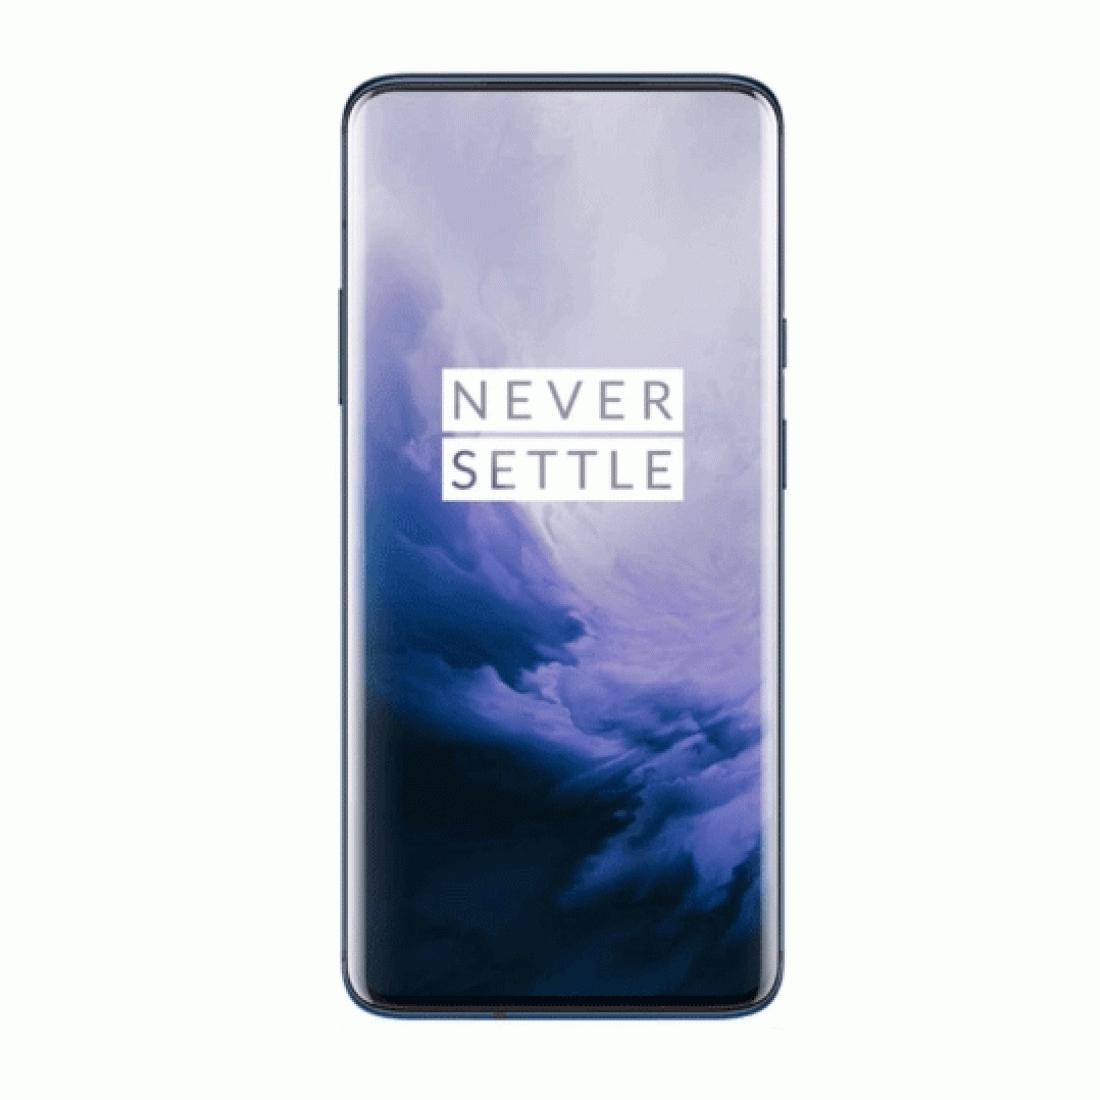 OnePlus 7 Pro 256GB 5G Blue (Grade B) - £349.95 @ Refurb Phone